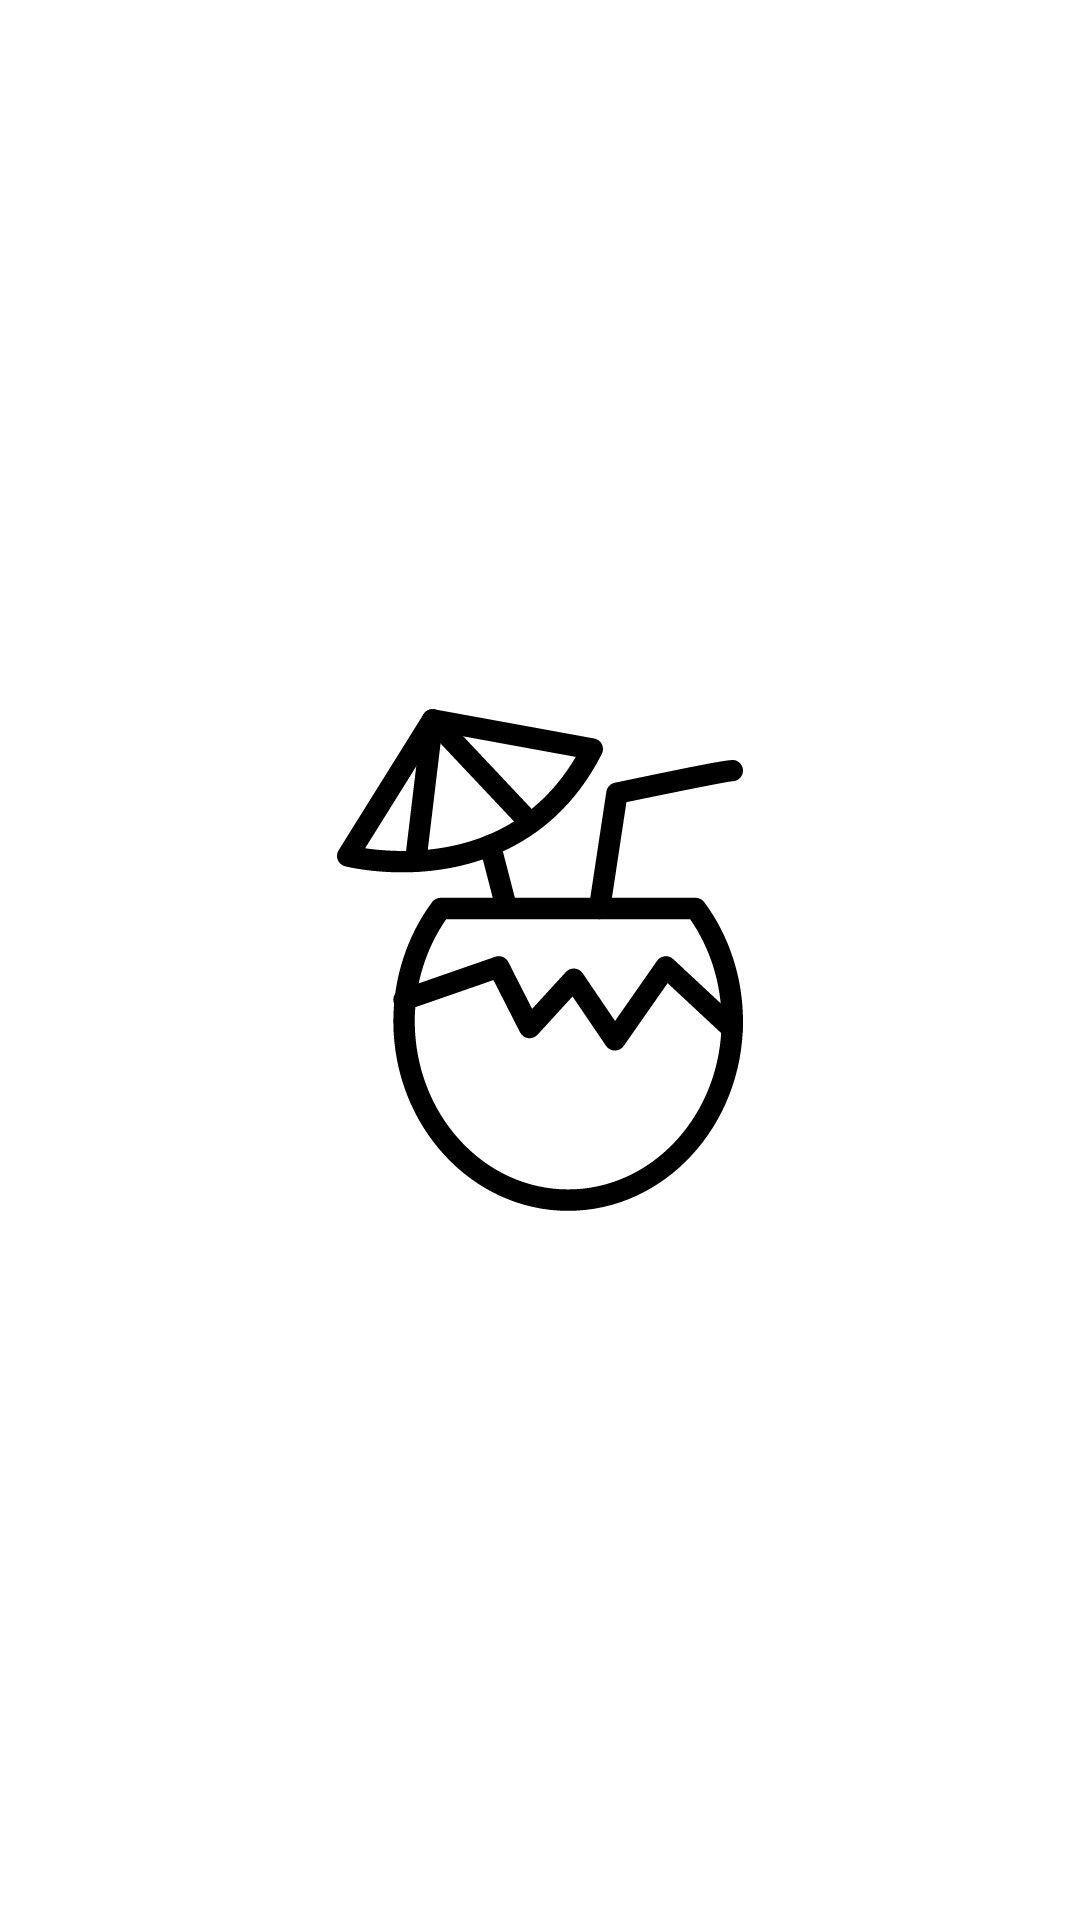 Drawings Croquisfacile Designs Easysketch Einfacheskizze Croquisfacile Designs Drawings Easysketch Ein Easy Drawings Cute Easy Drawings Mini Drawings